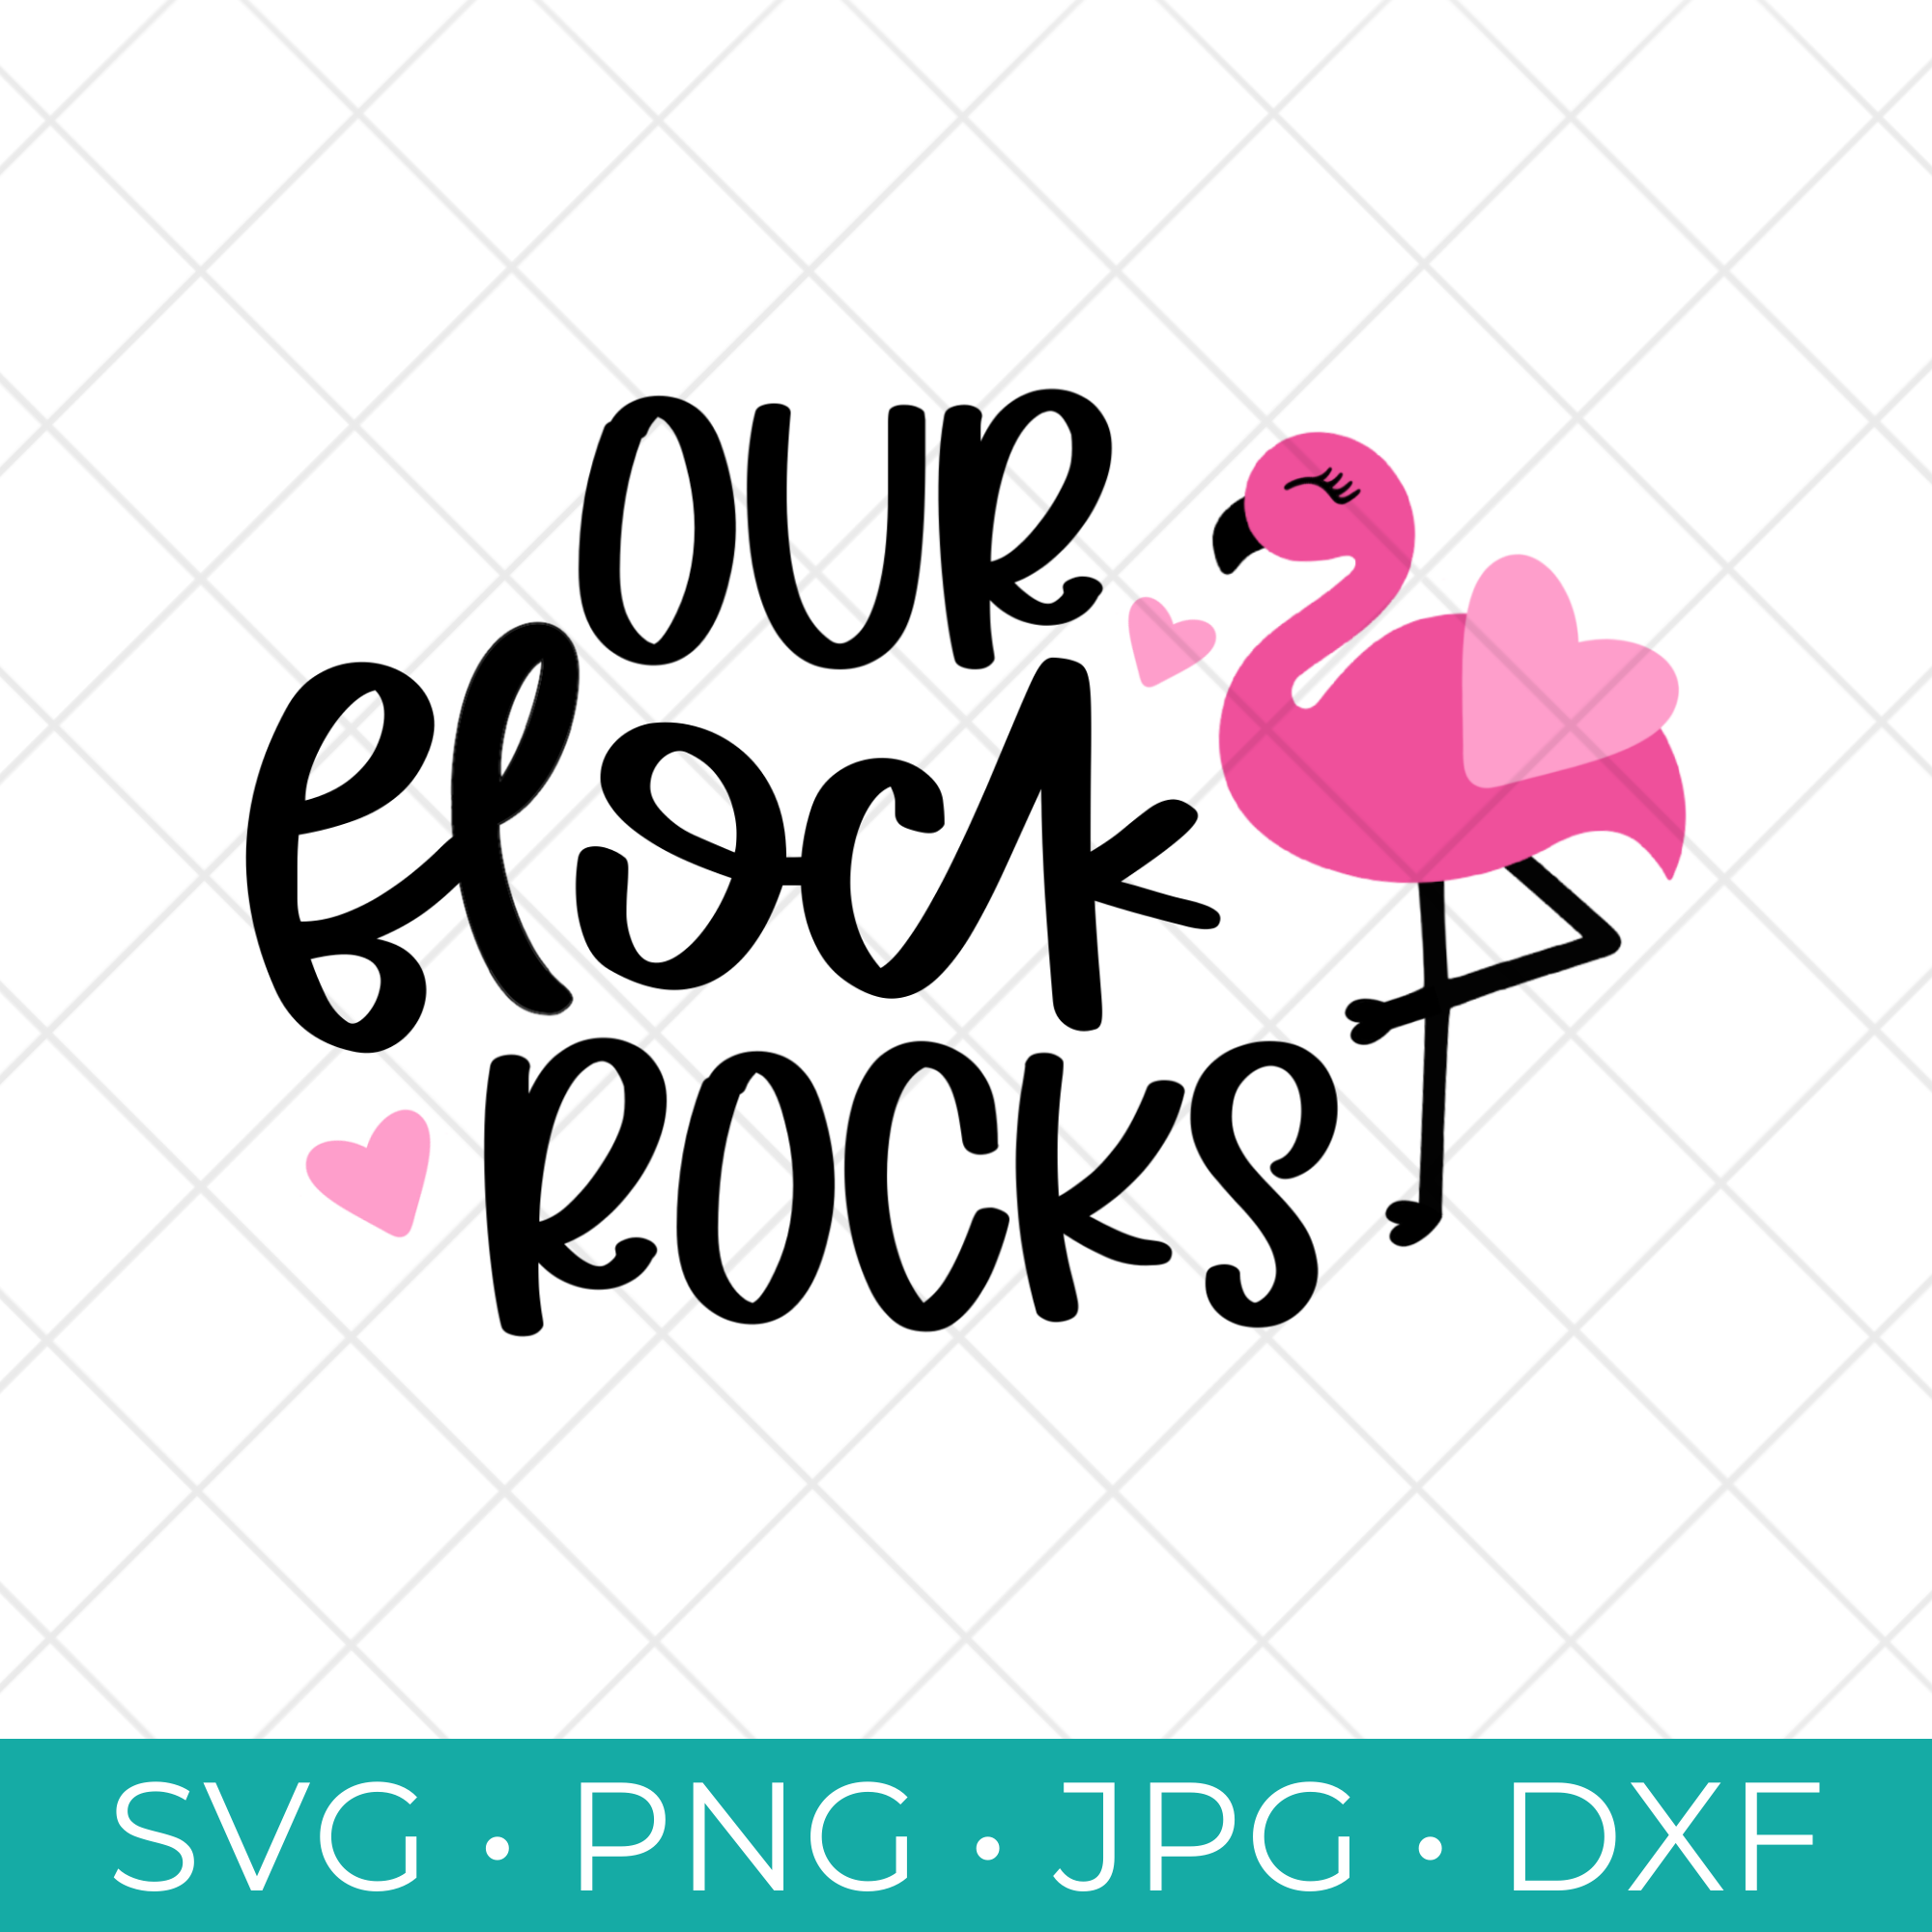 Free Our Flock Rocks SVG